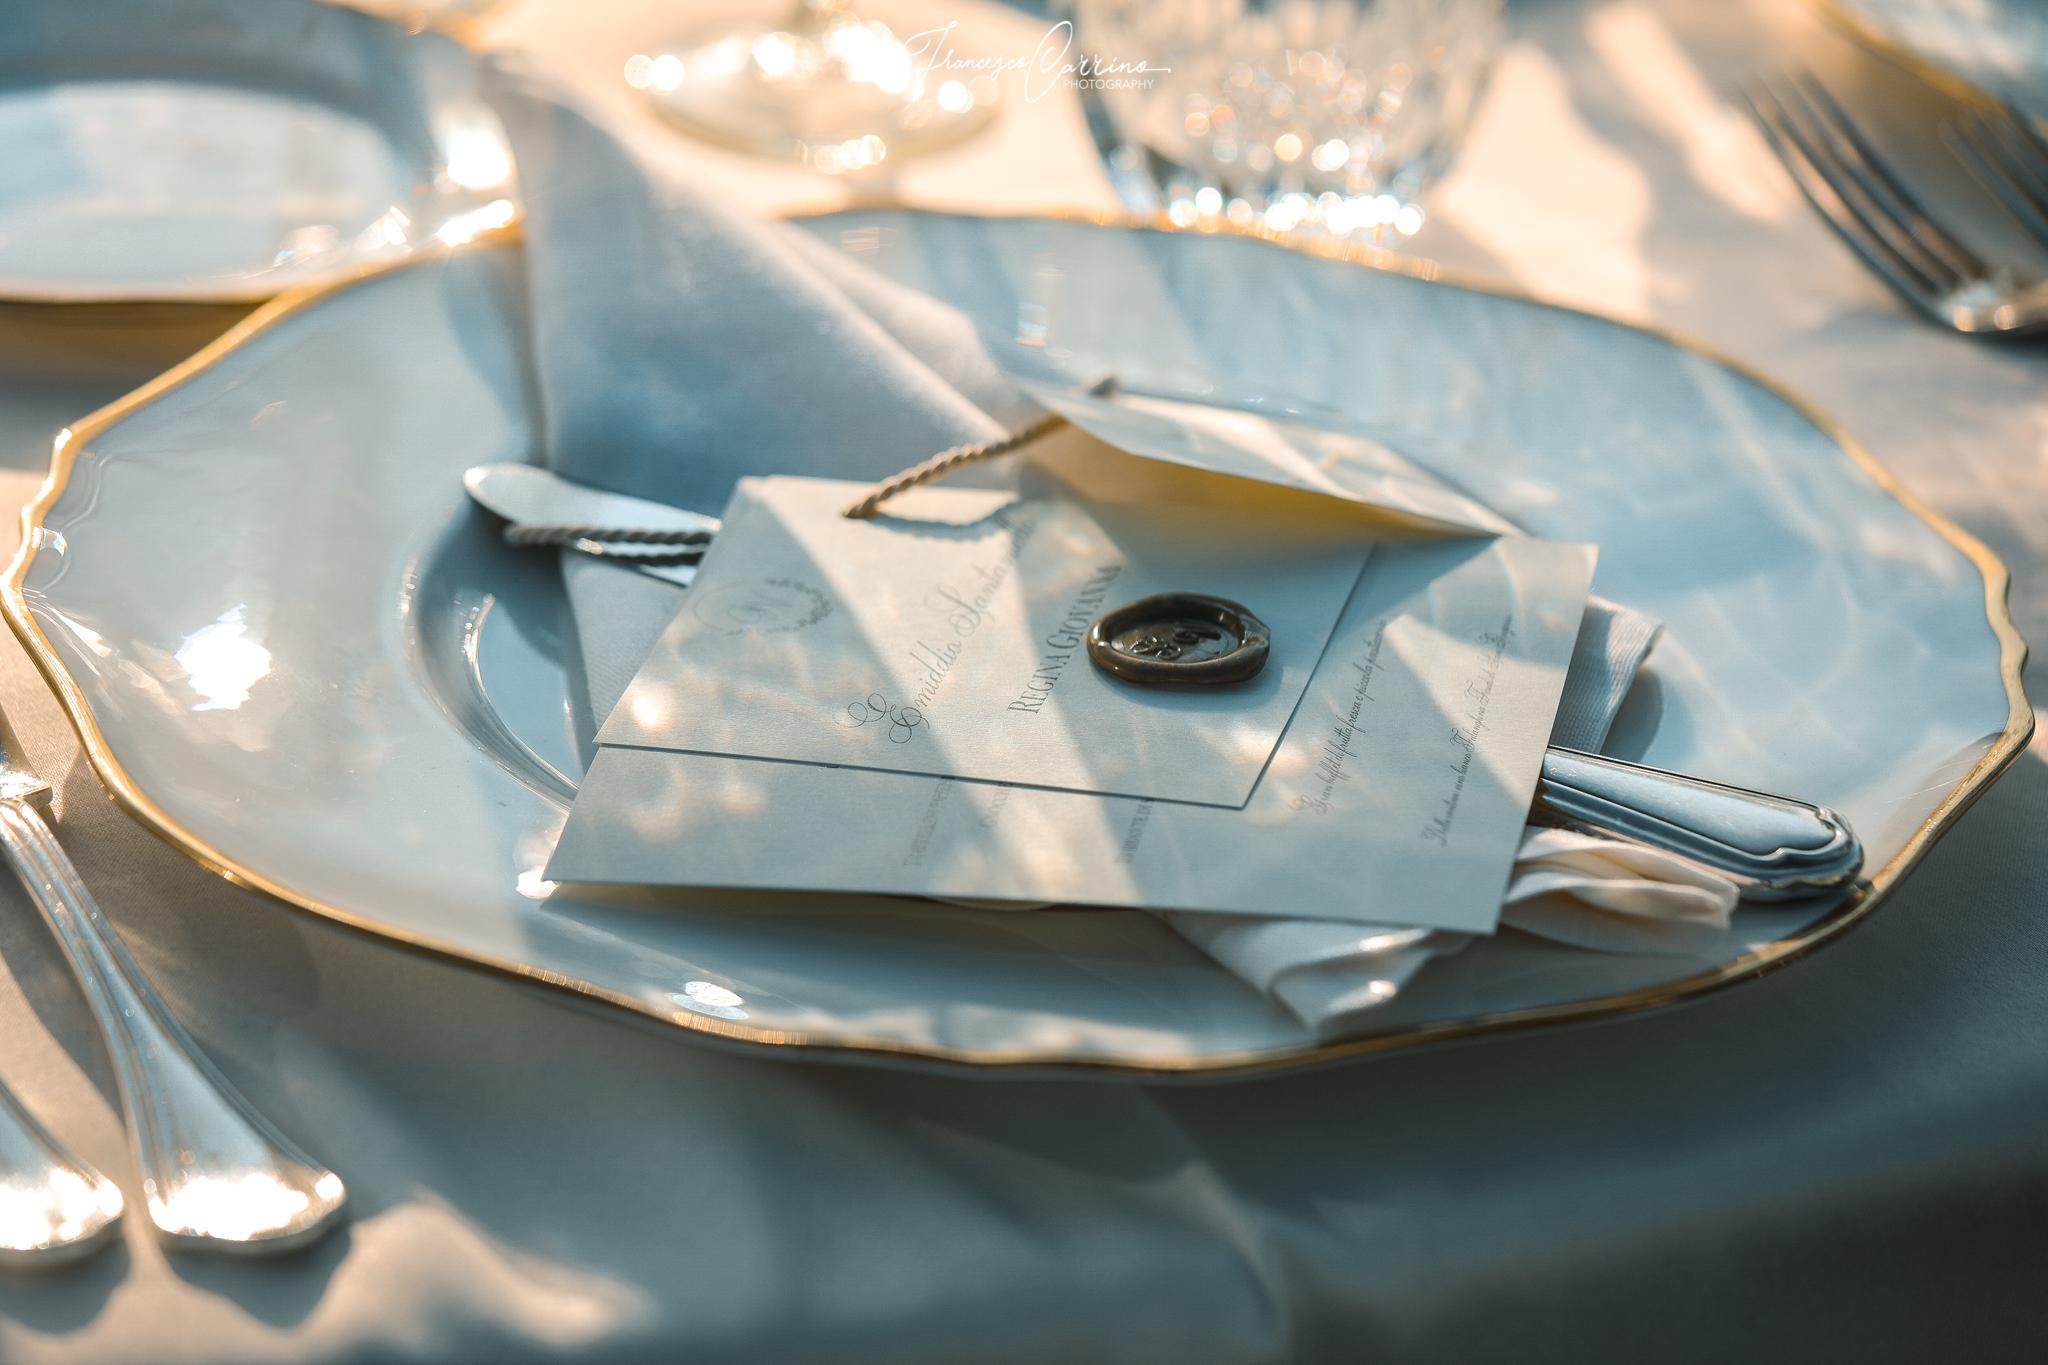 http://www.weddingamalfi.com/wp-content/uploads/Giannenza-13-luglio-2019-12.jpg